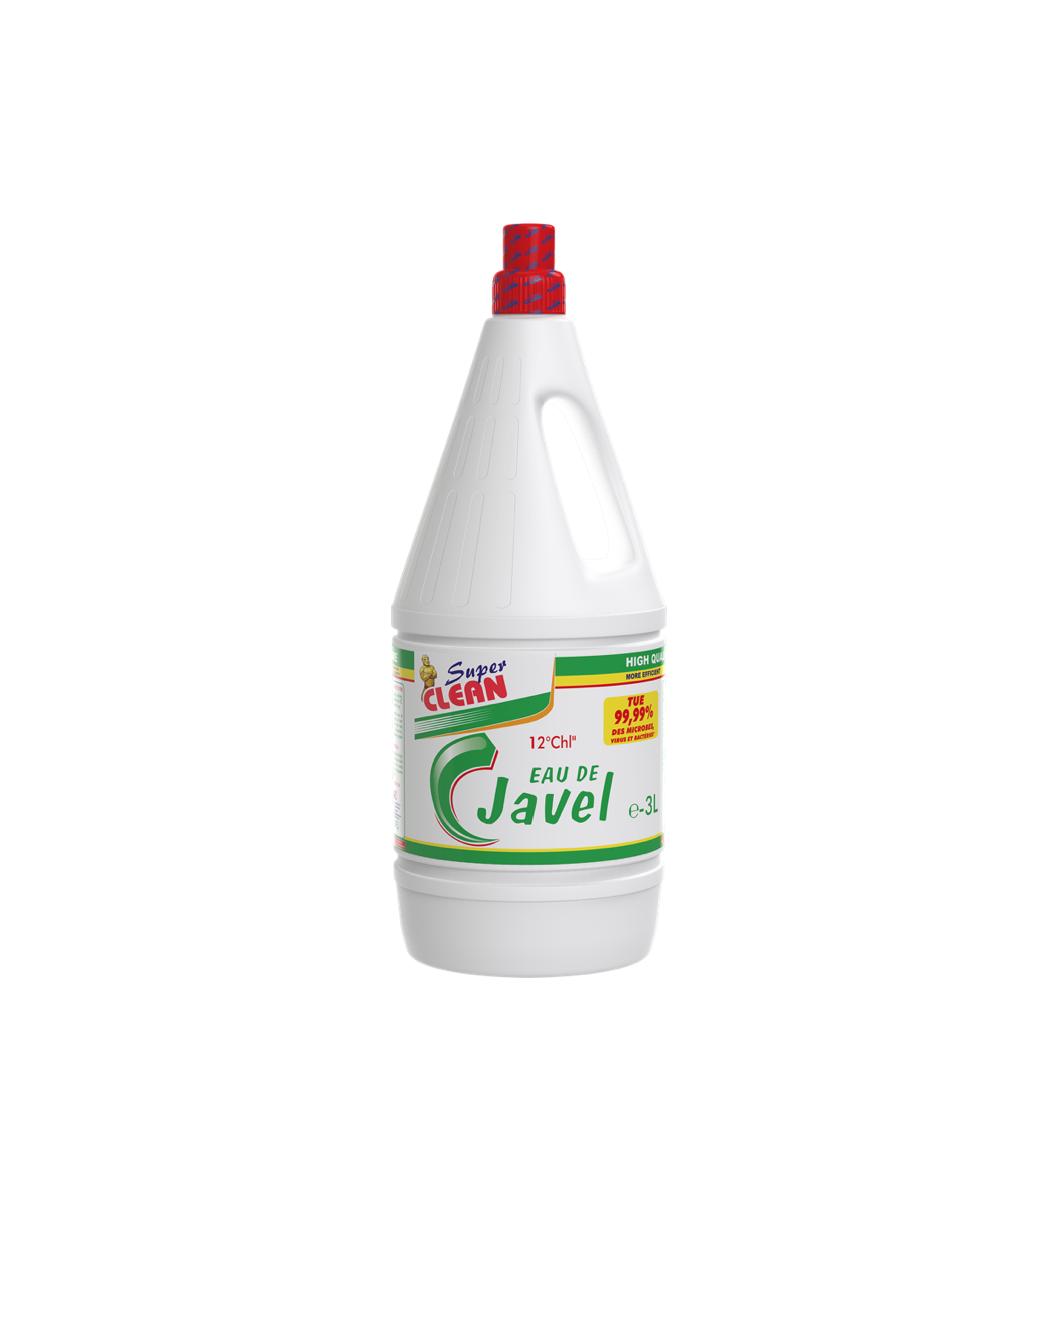 SUPER CLEAN_Eau de Javel 12° 3L